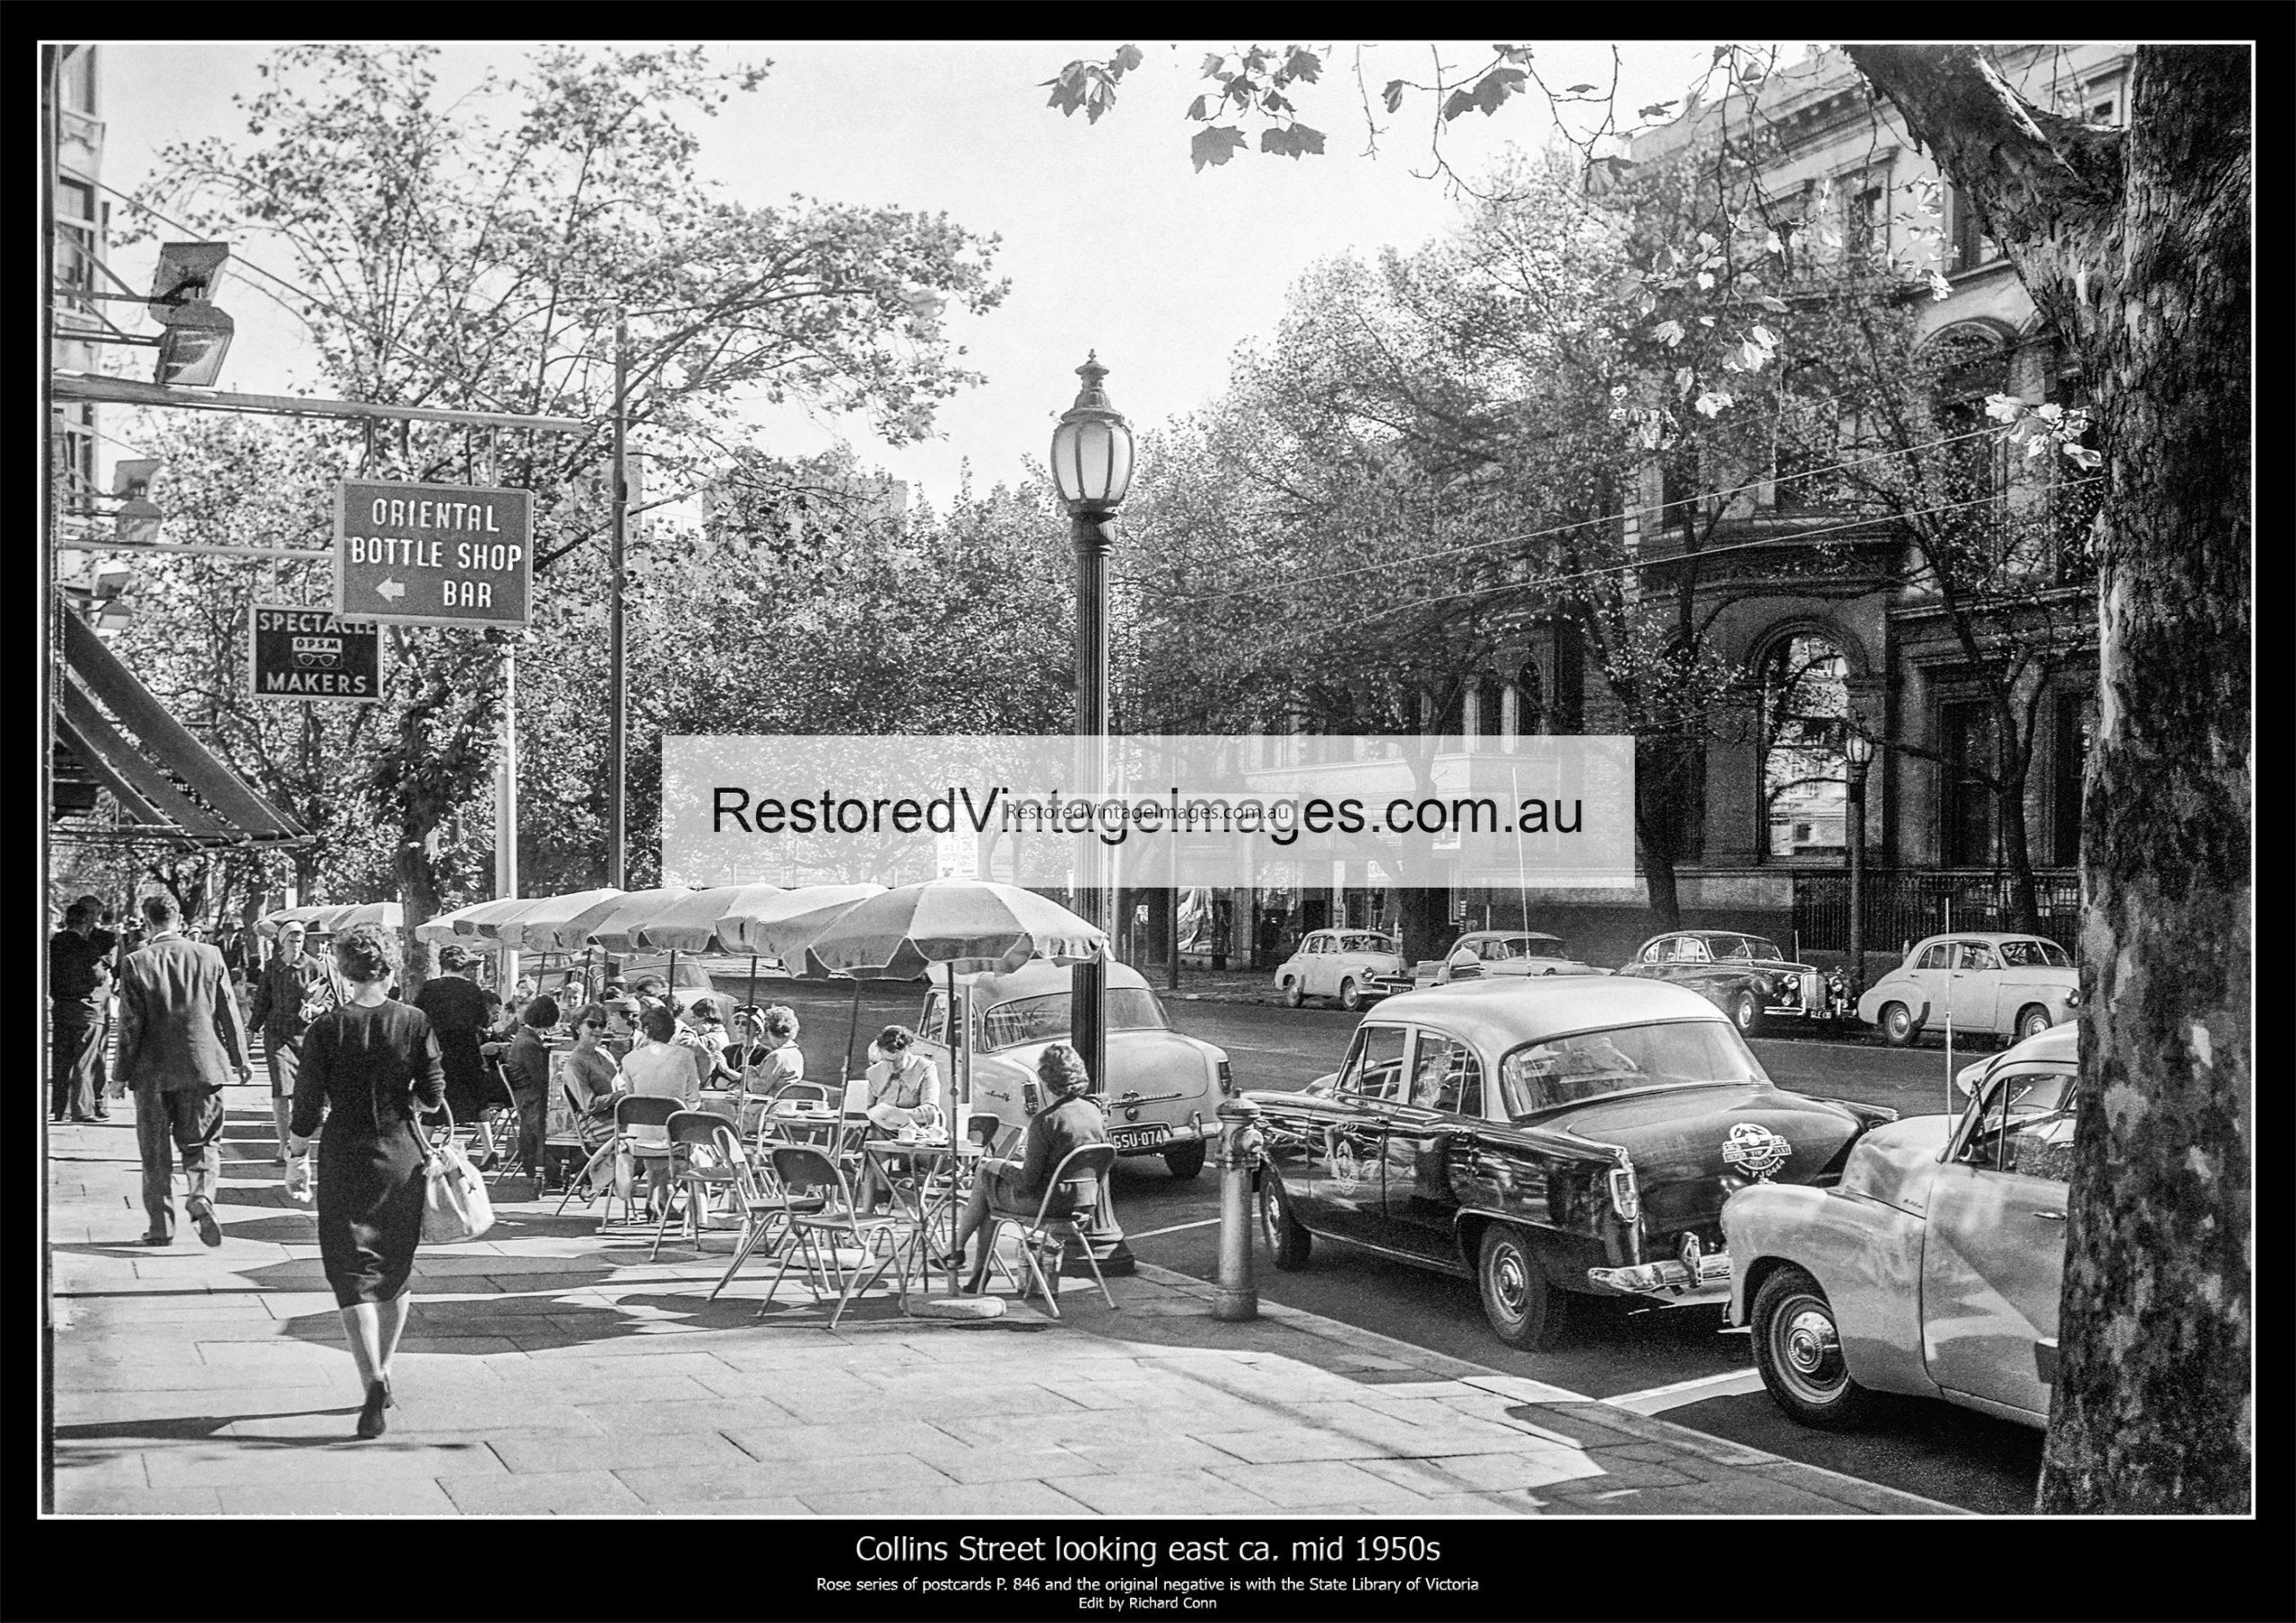 Footpath Cafe On Collins Street Ca. Mid 1950s